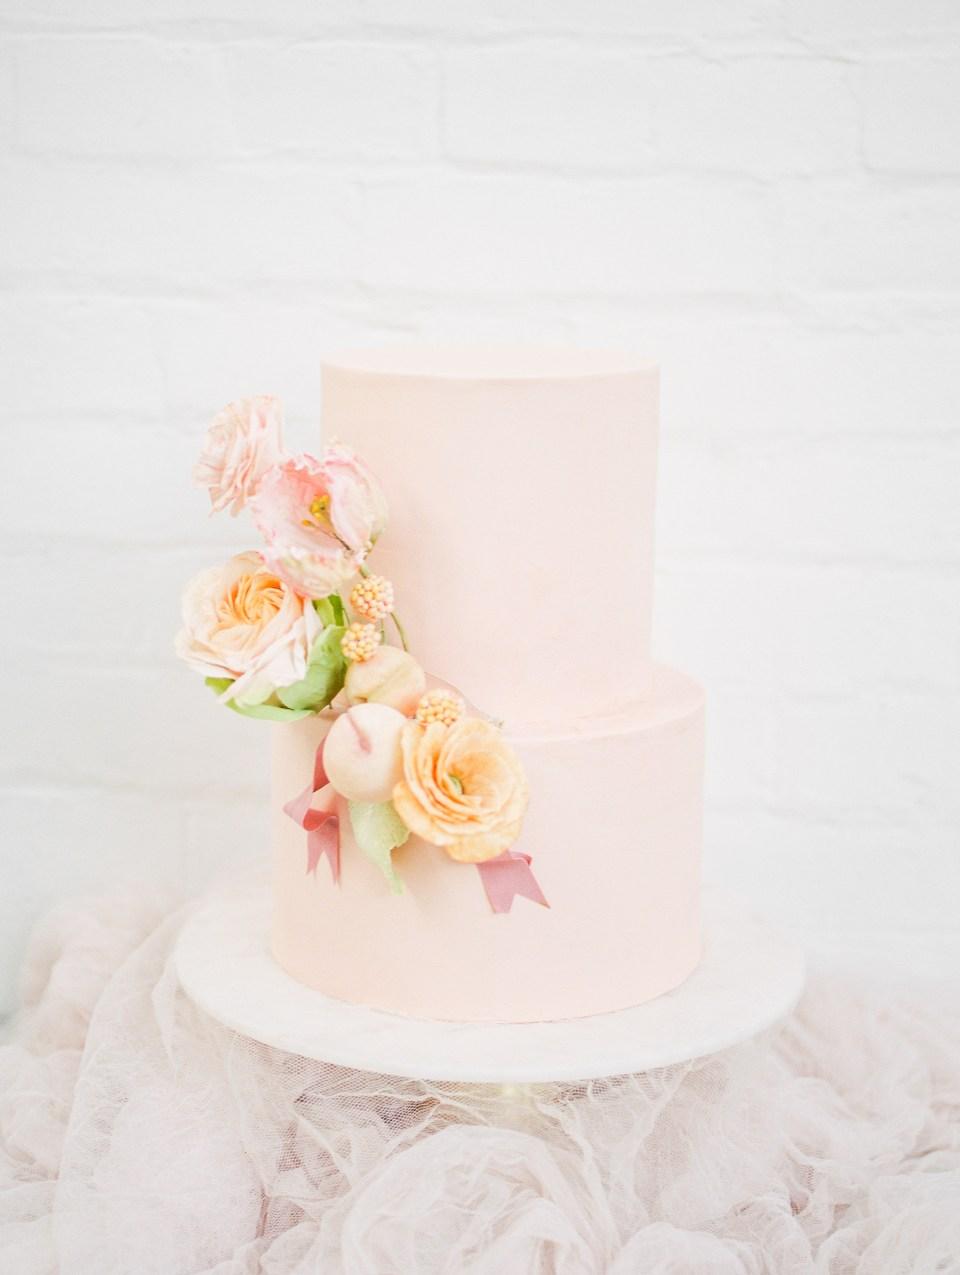 blush-modern-cake-organic-florals-wedding-photo